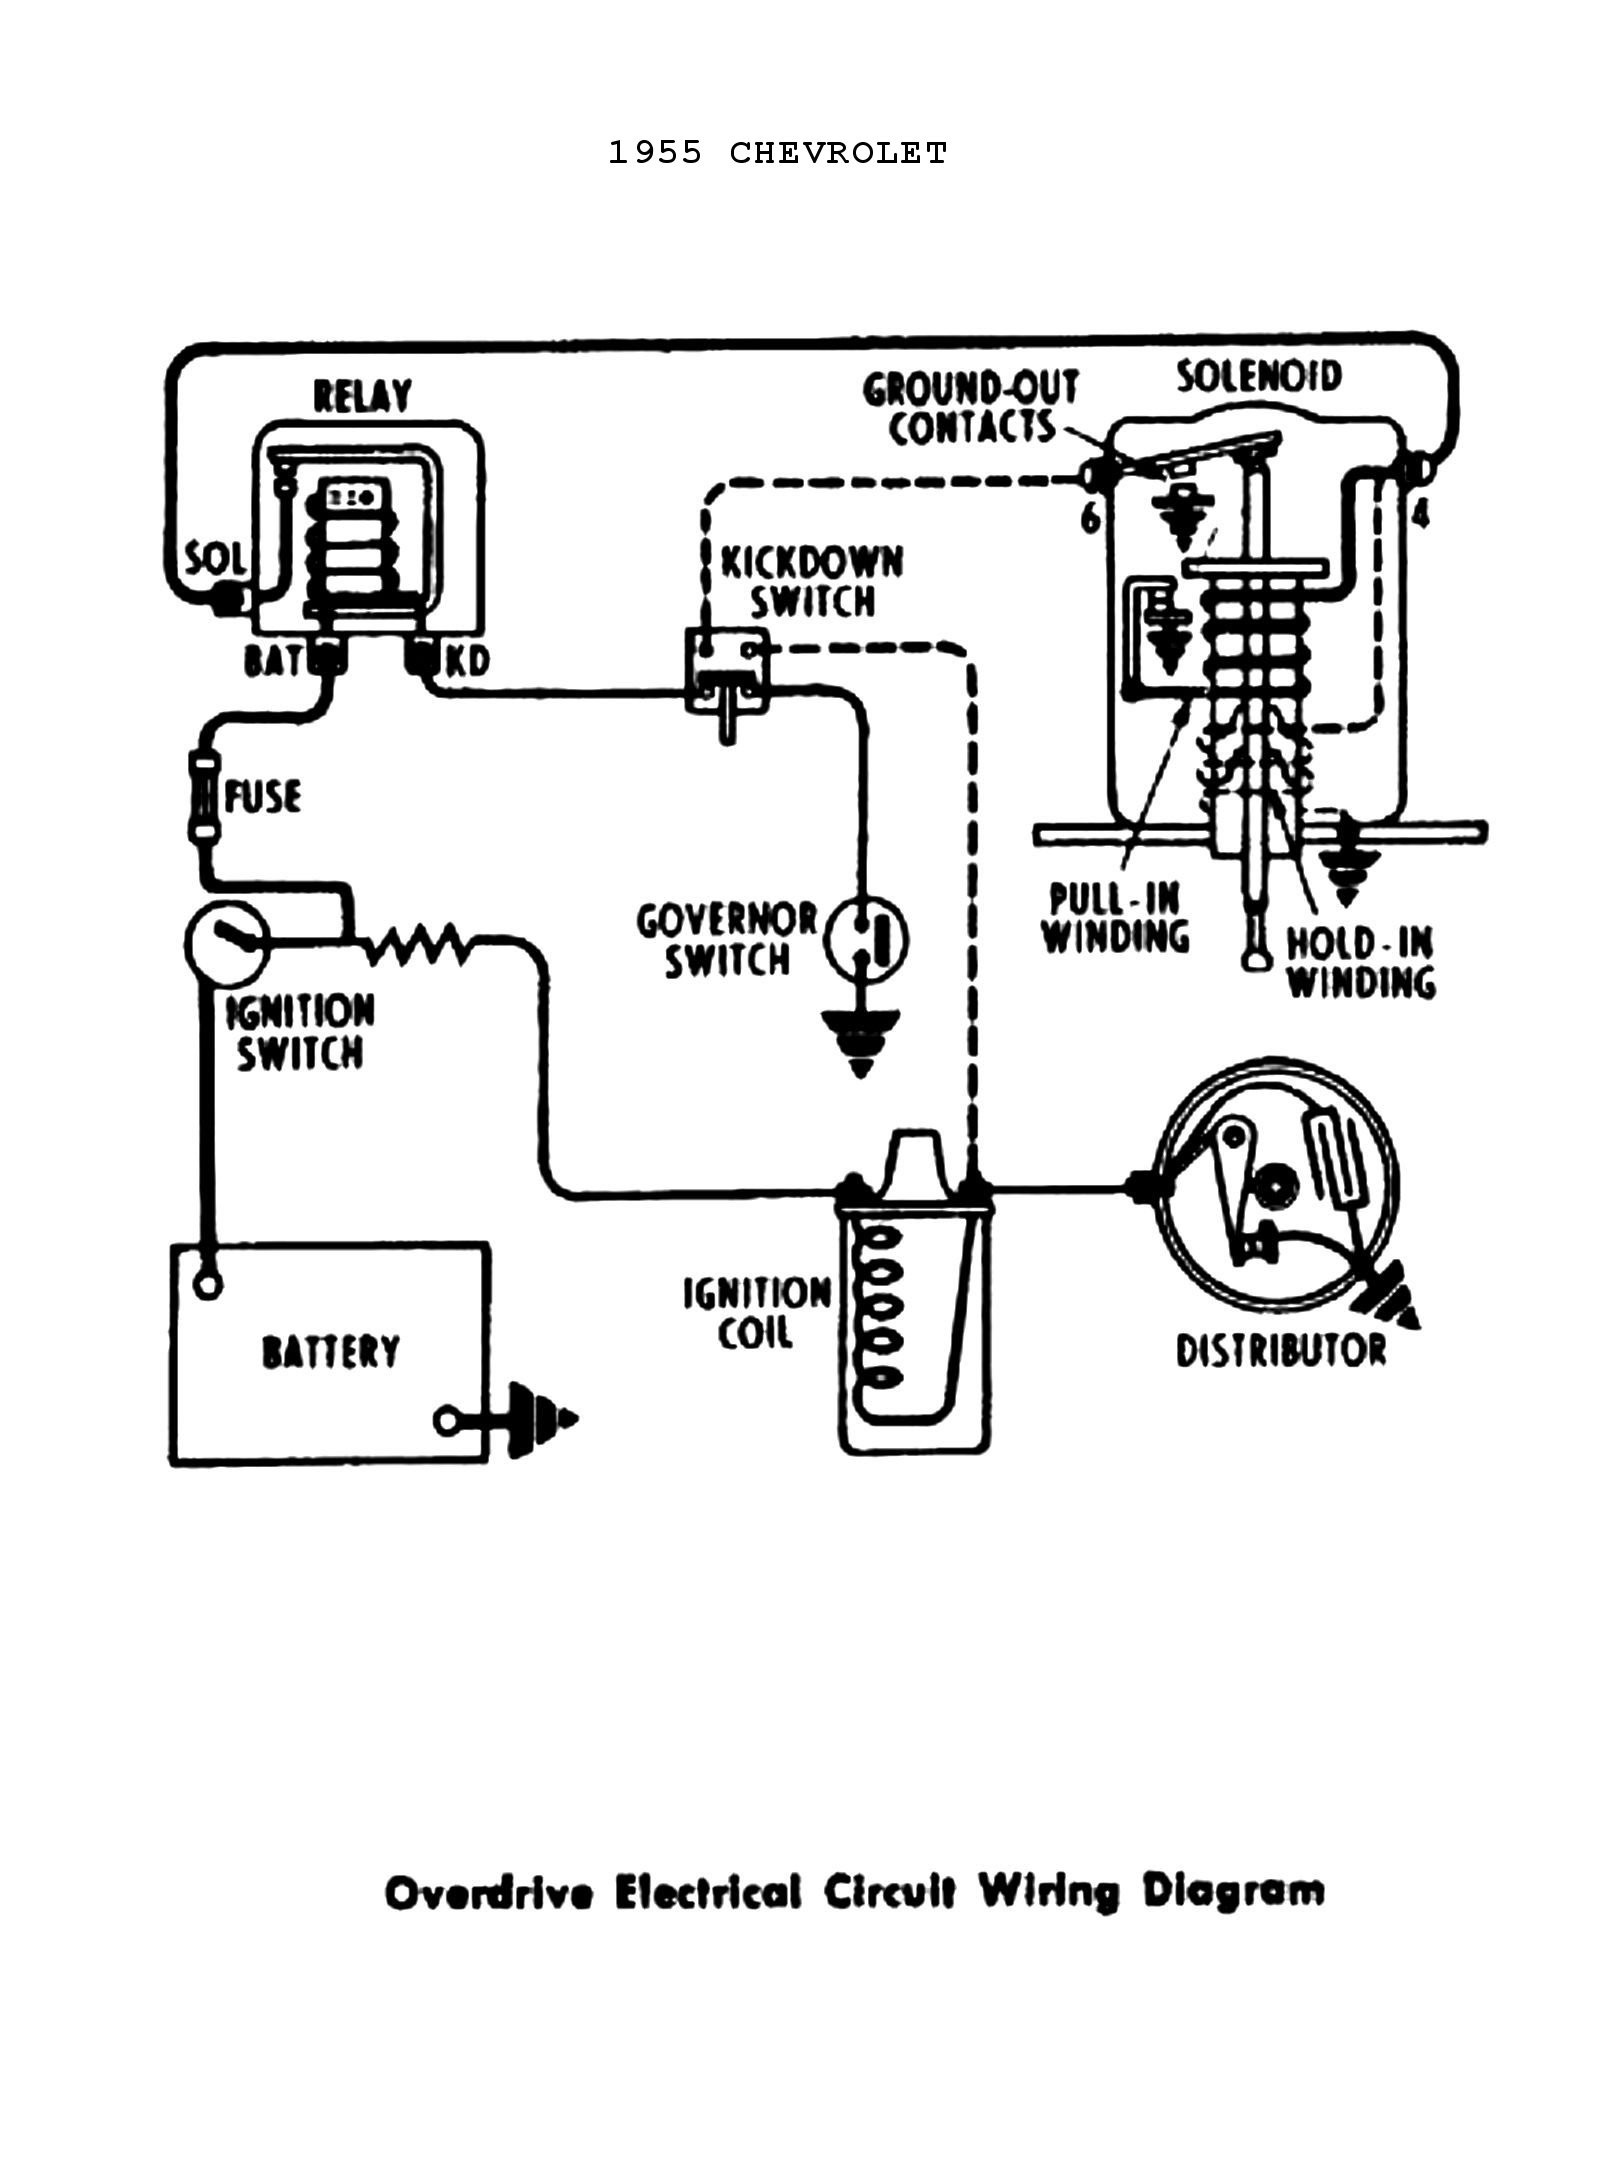 1957 chevy generator wiring diagram wiring diagram 1956 bel air wiring diagram 1957 chevy truck wiring